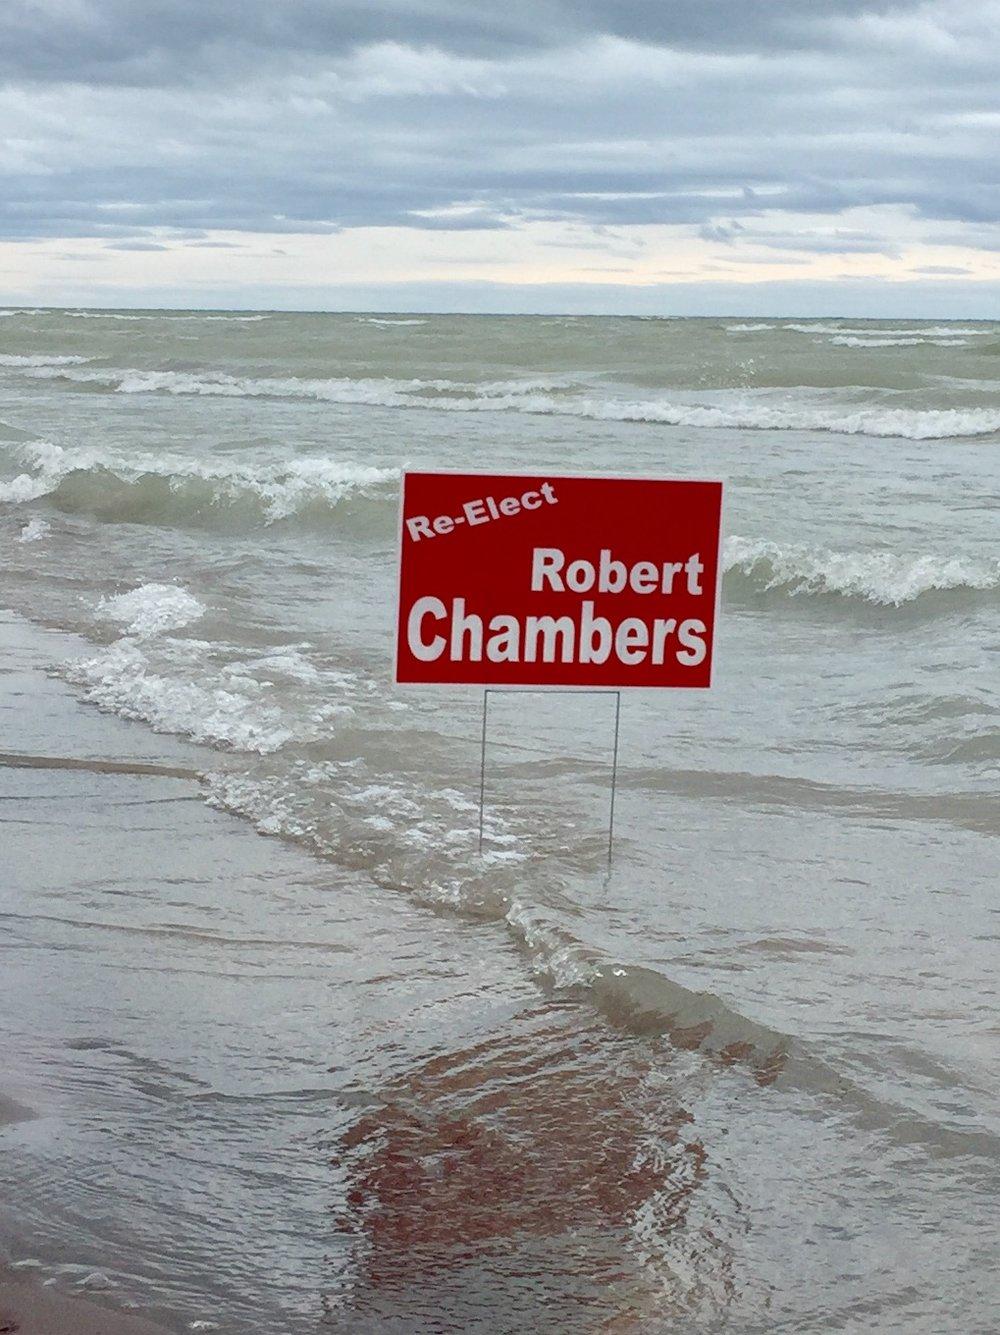 Re-Elect Robert Chambers -